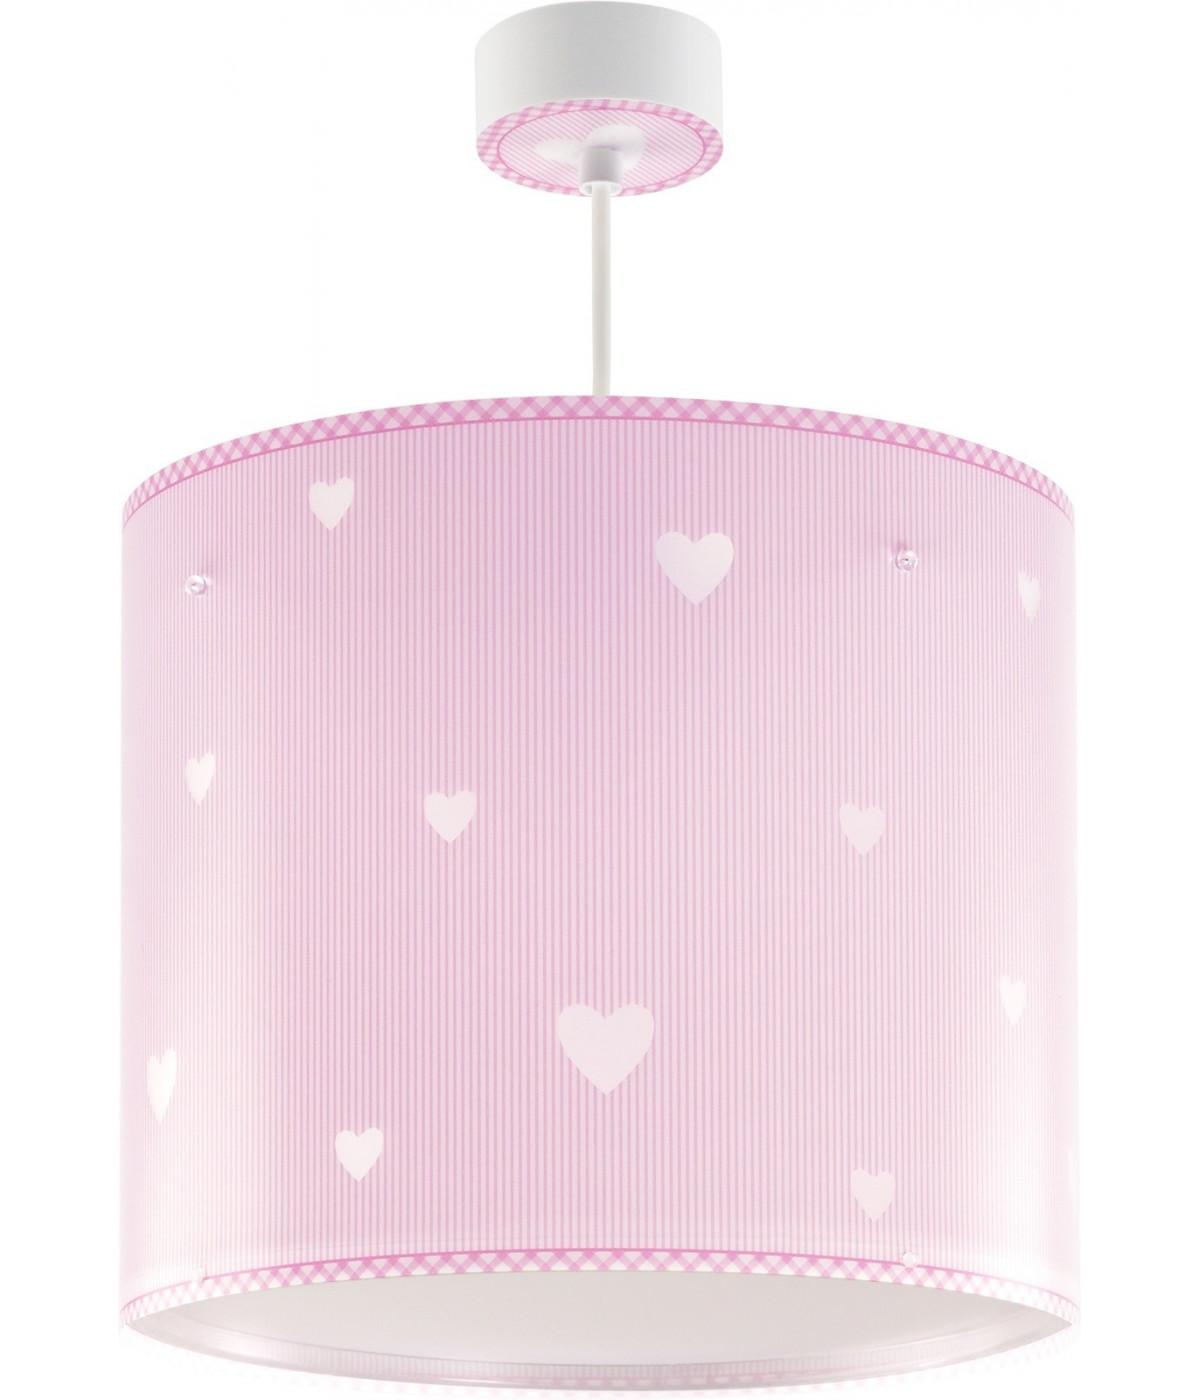 Lampada a sospensione per bambini Sweet Dreams rosa